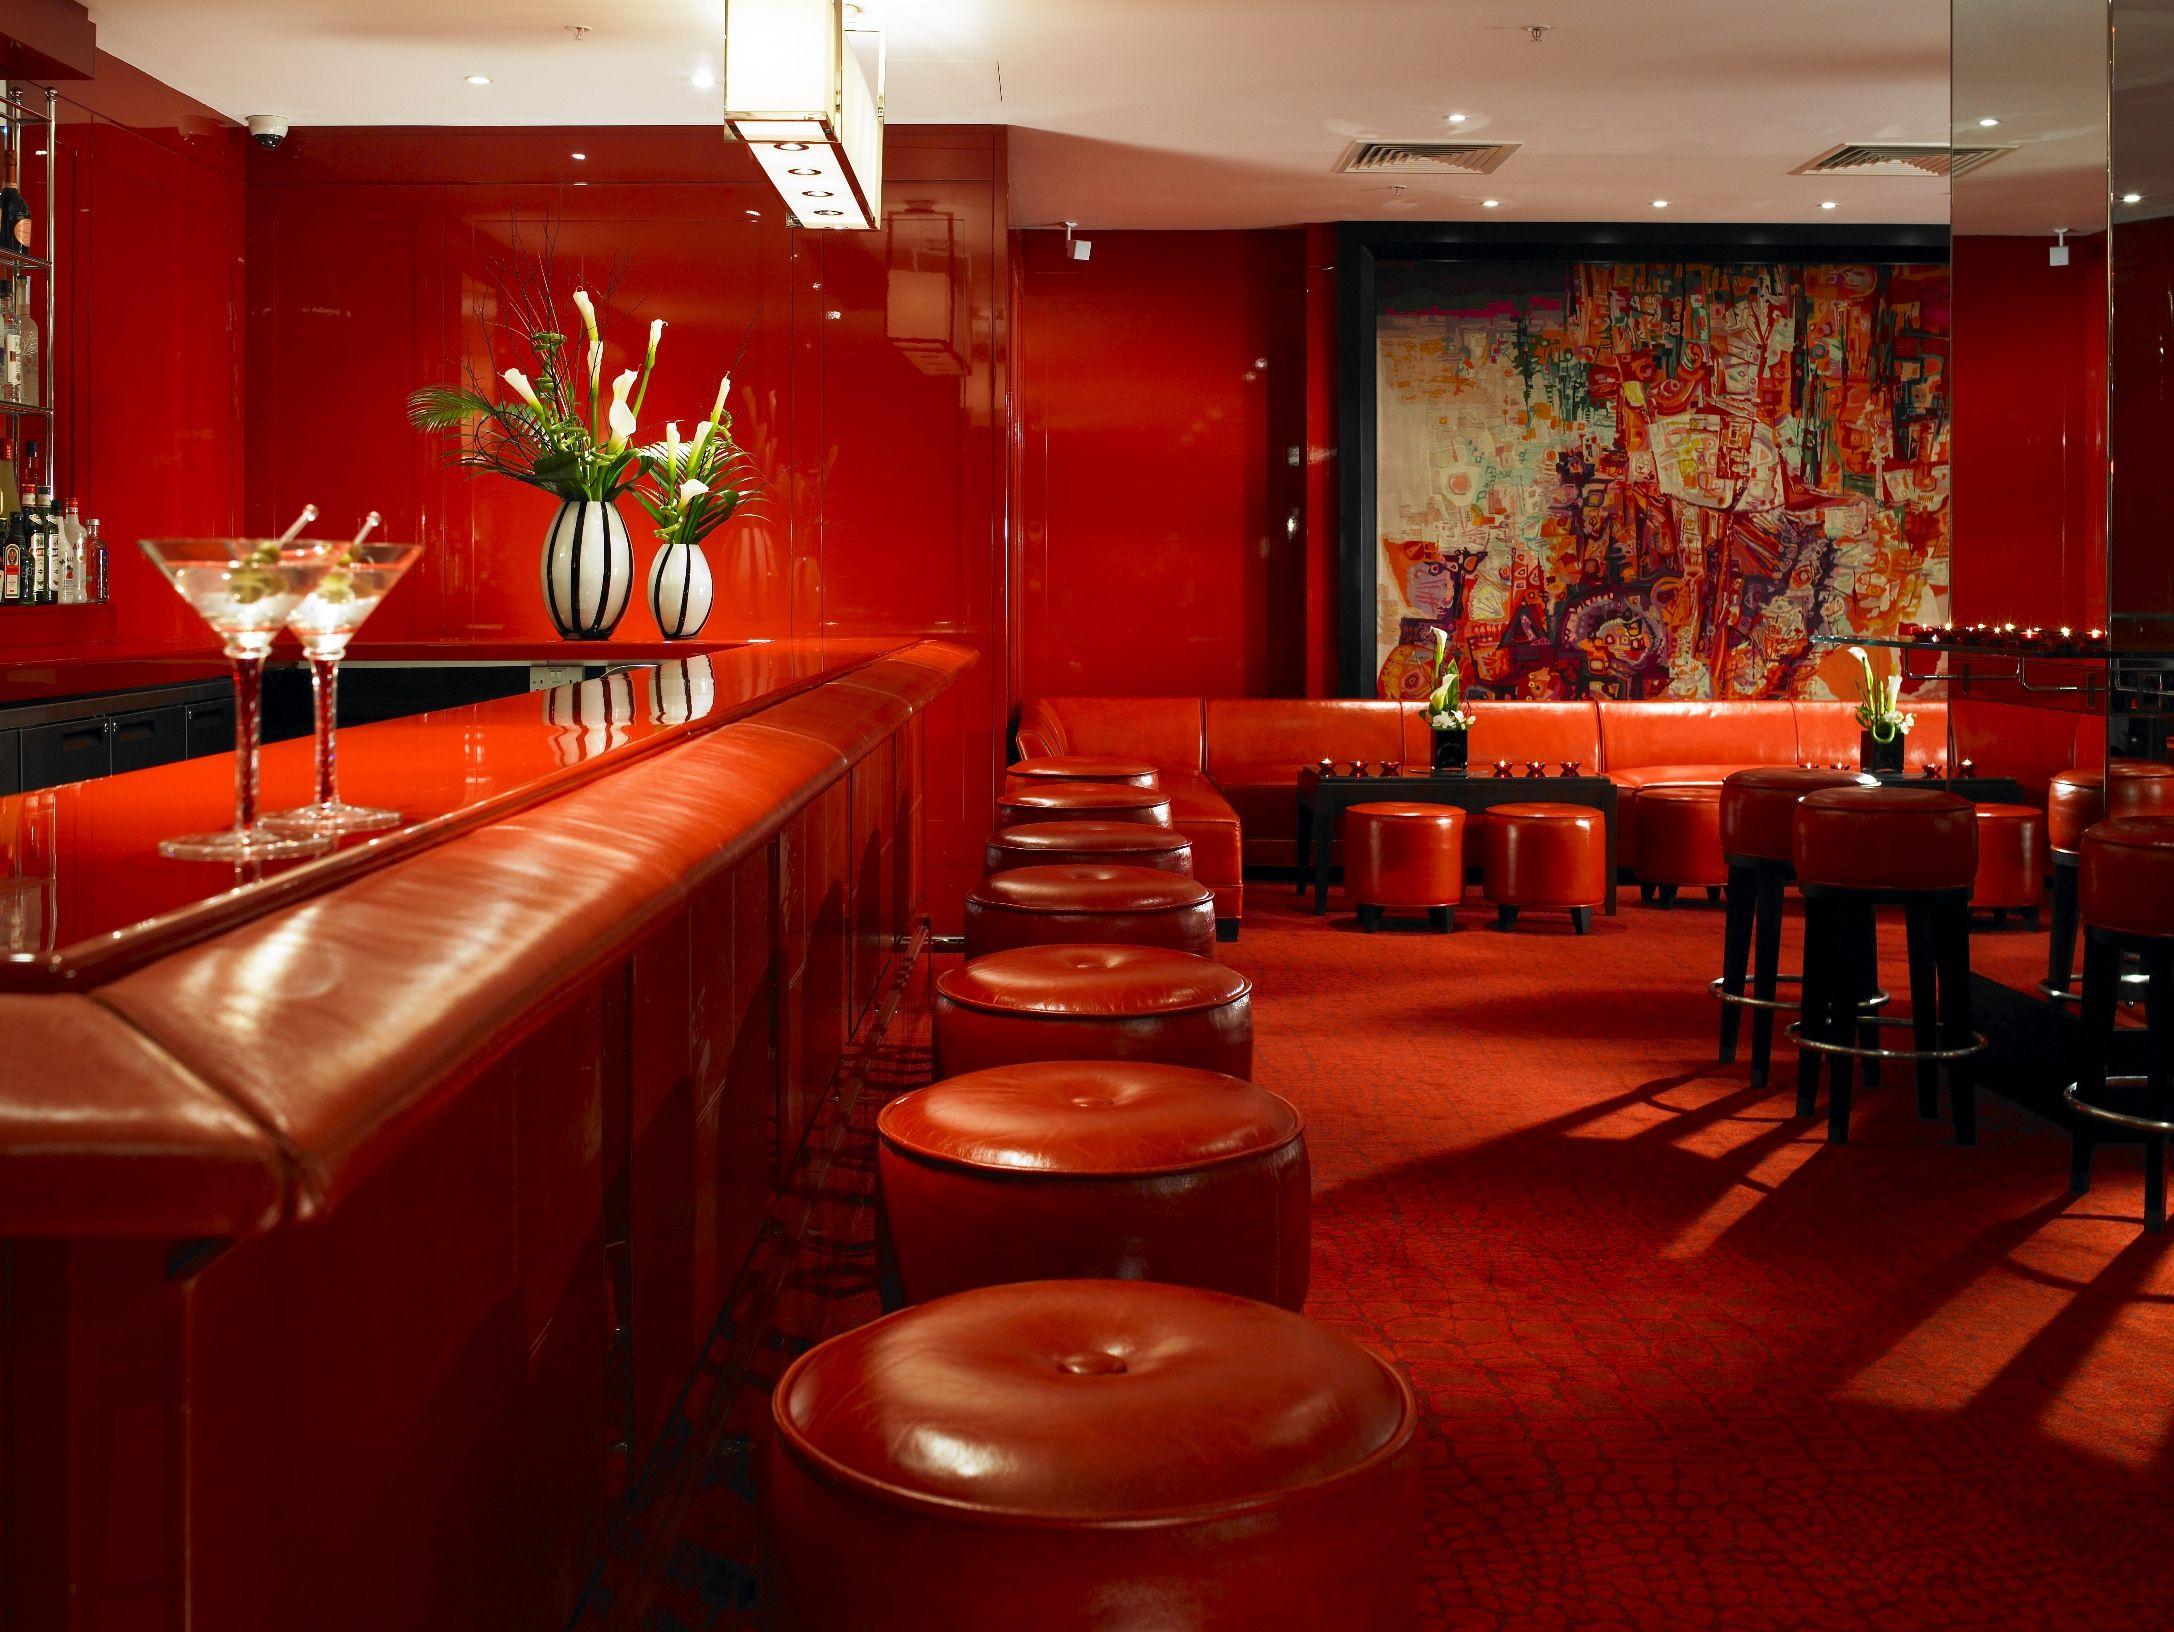 Red Bar At Grosvenor House A Jw Marriott Hotel In Mayfair Greater London Red Bar Padded Bar Stools Grosvenor House